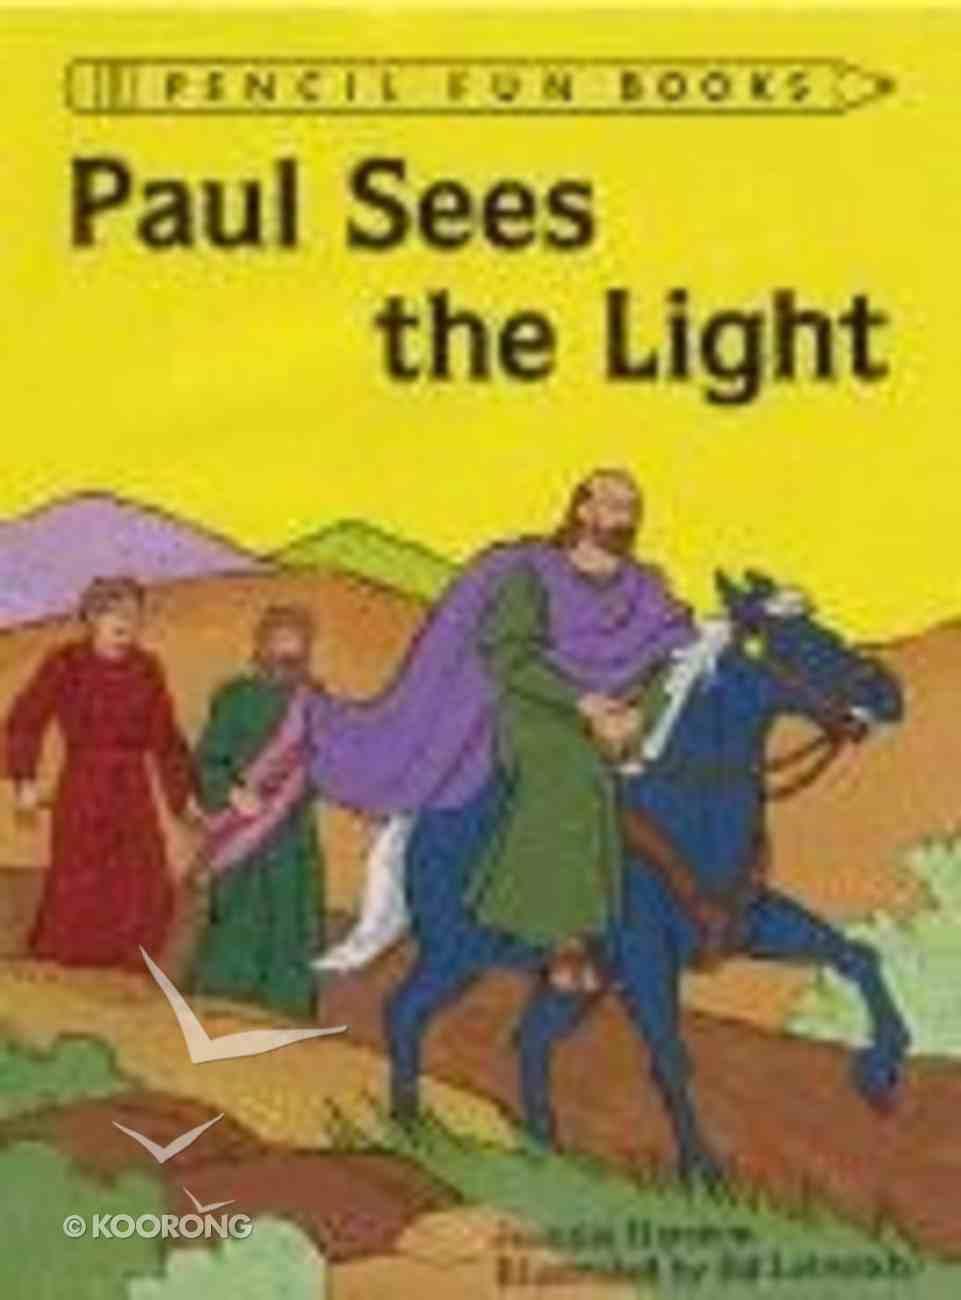 Paul Sees the Light (Pencil Fun Books Series) Paperback